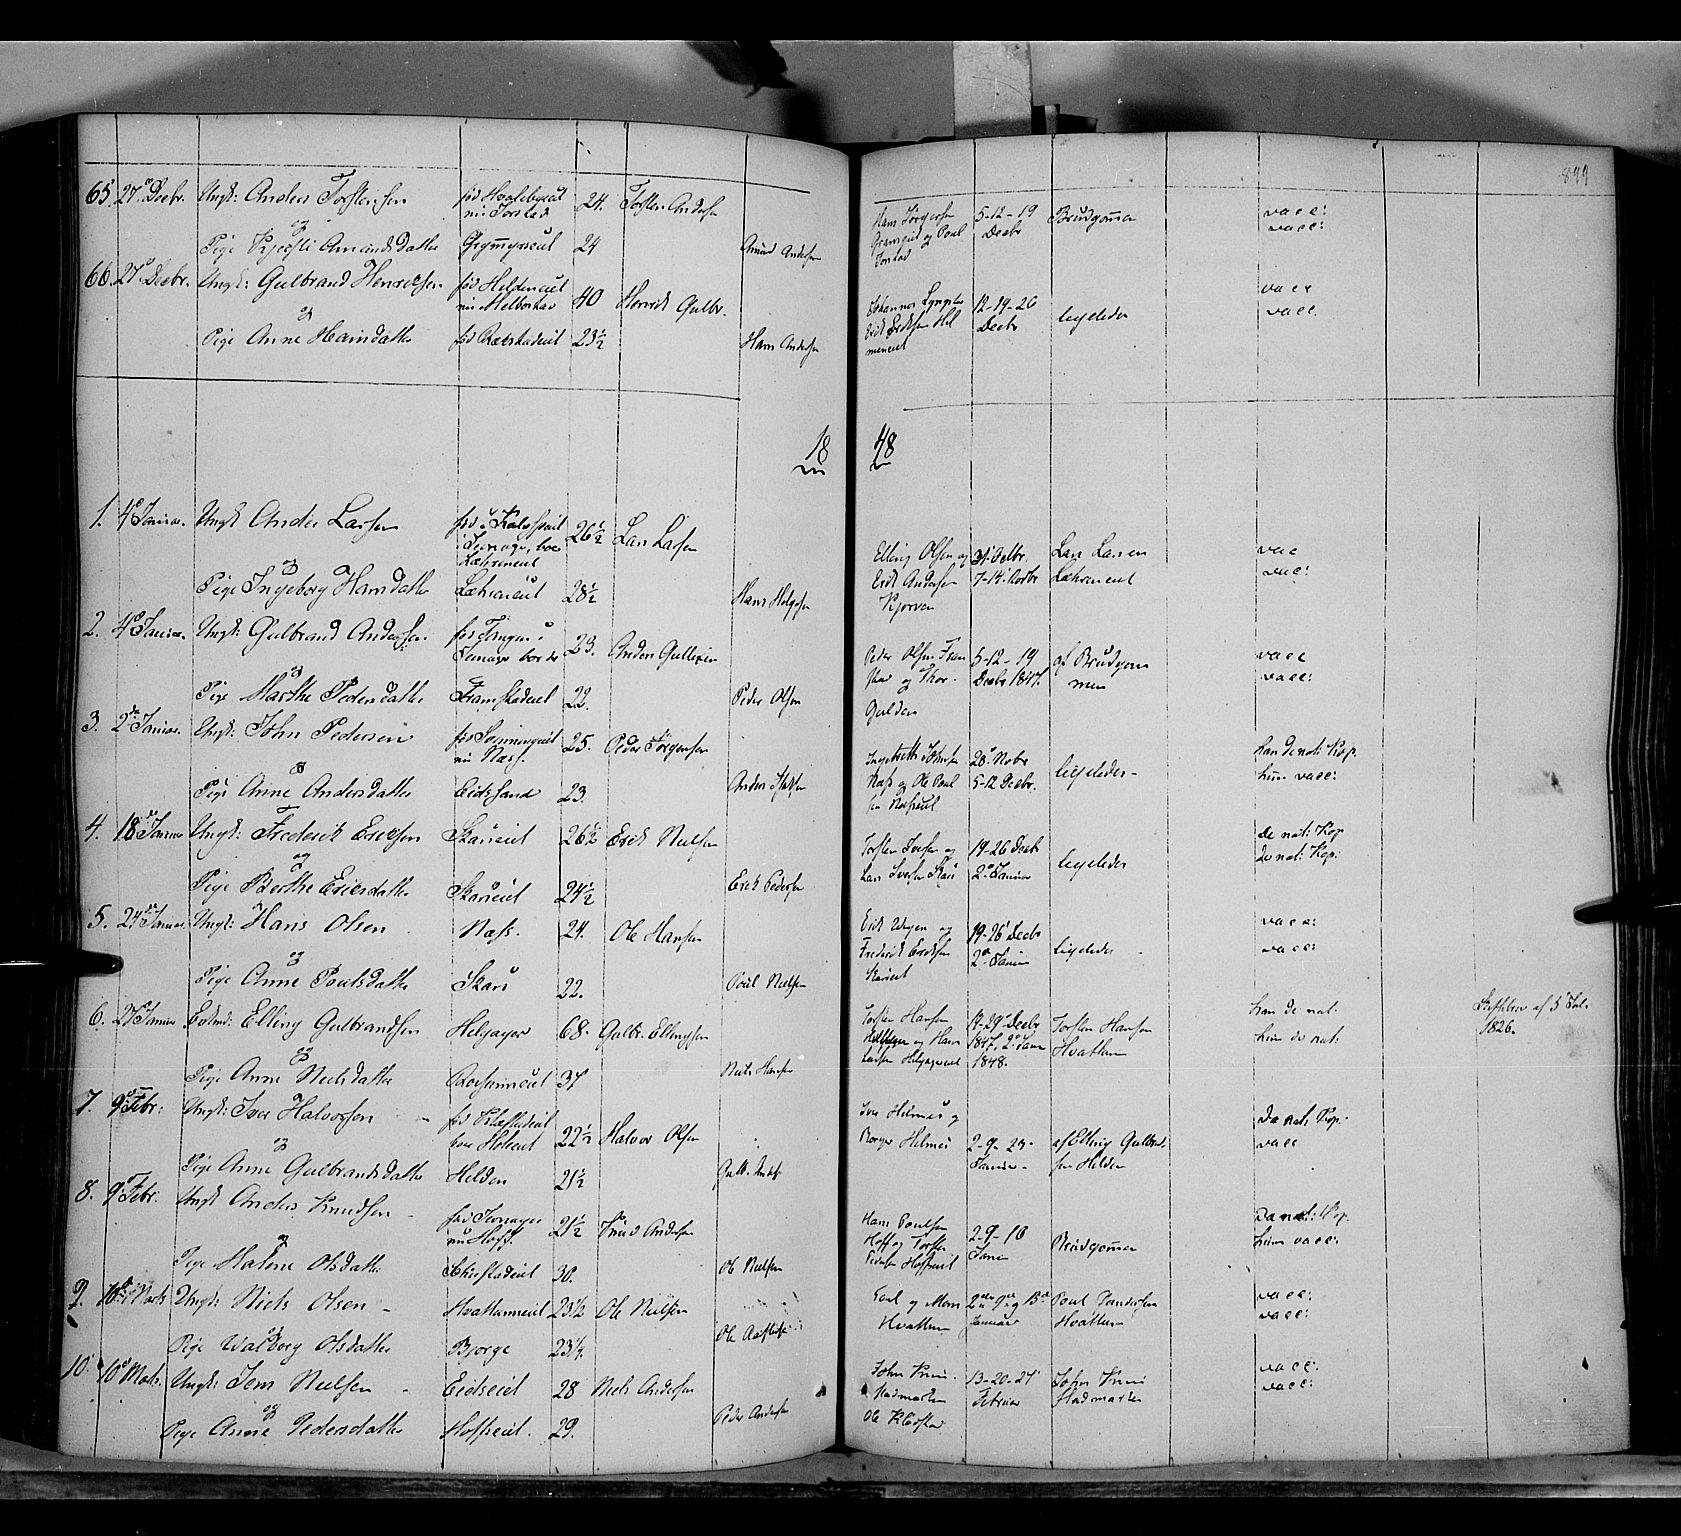 SAH, Gran prestekontor, Ministerialbok nr. 11, 1842-1856, s. 898-899